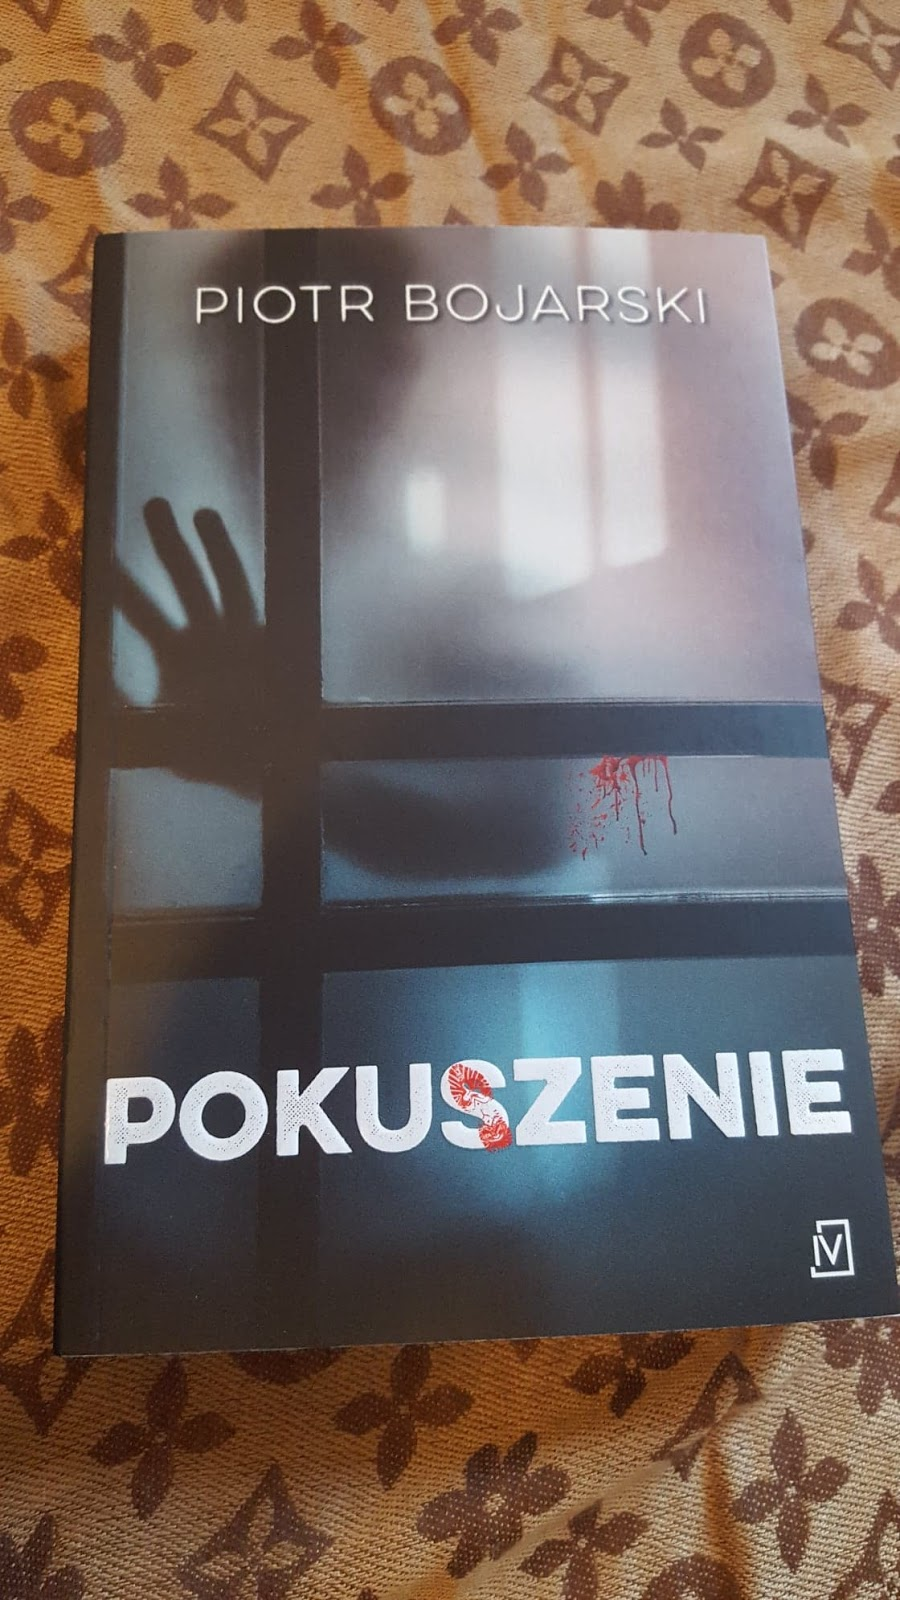 Piotr Bojarski - Pokuszenie